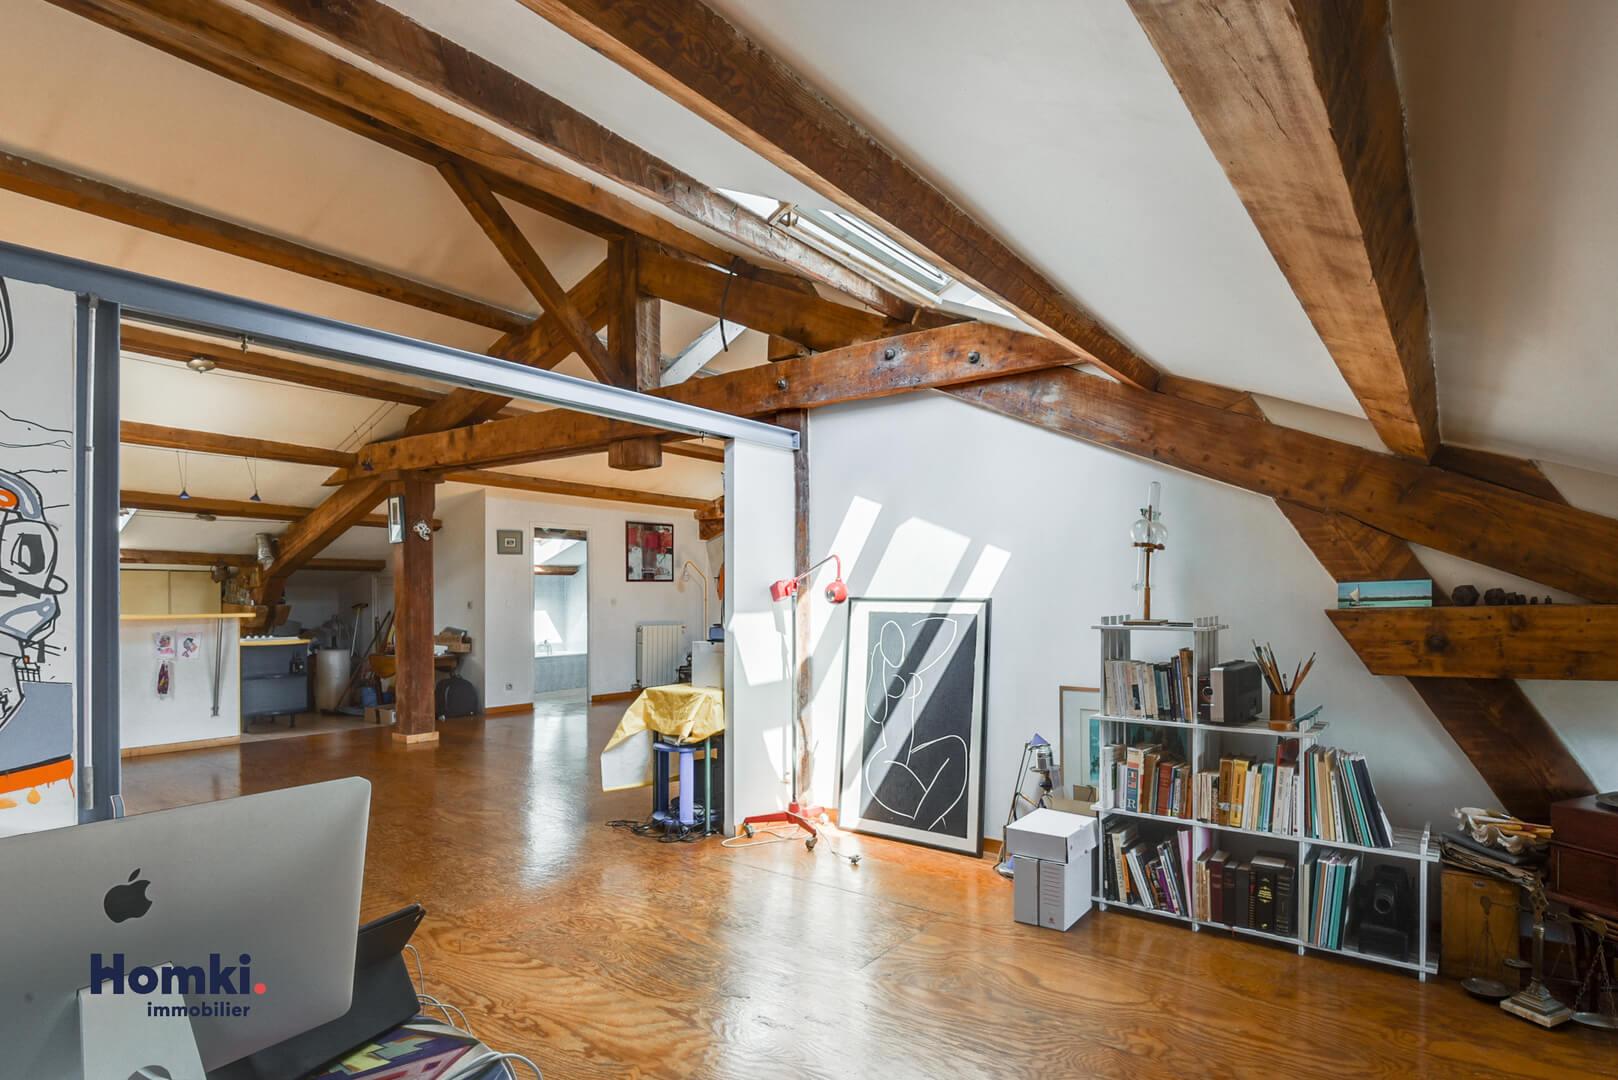 Vente loft Marseille T3 13013 130m²_4